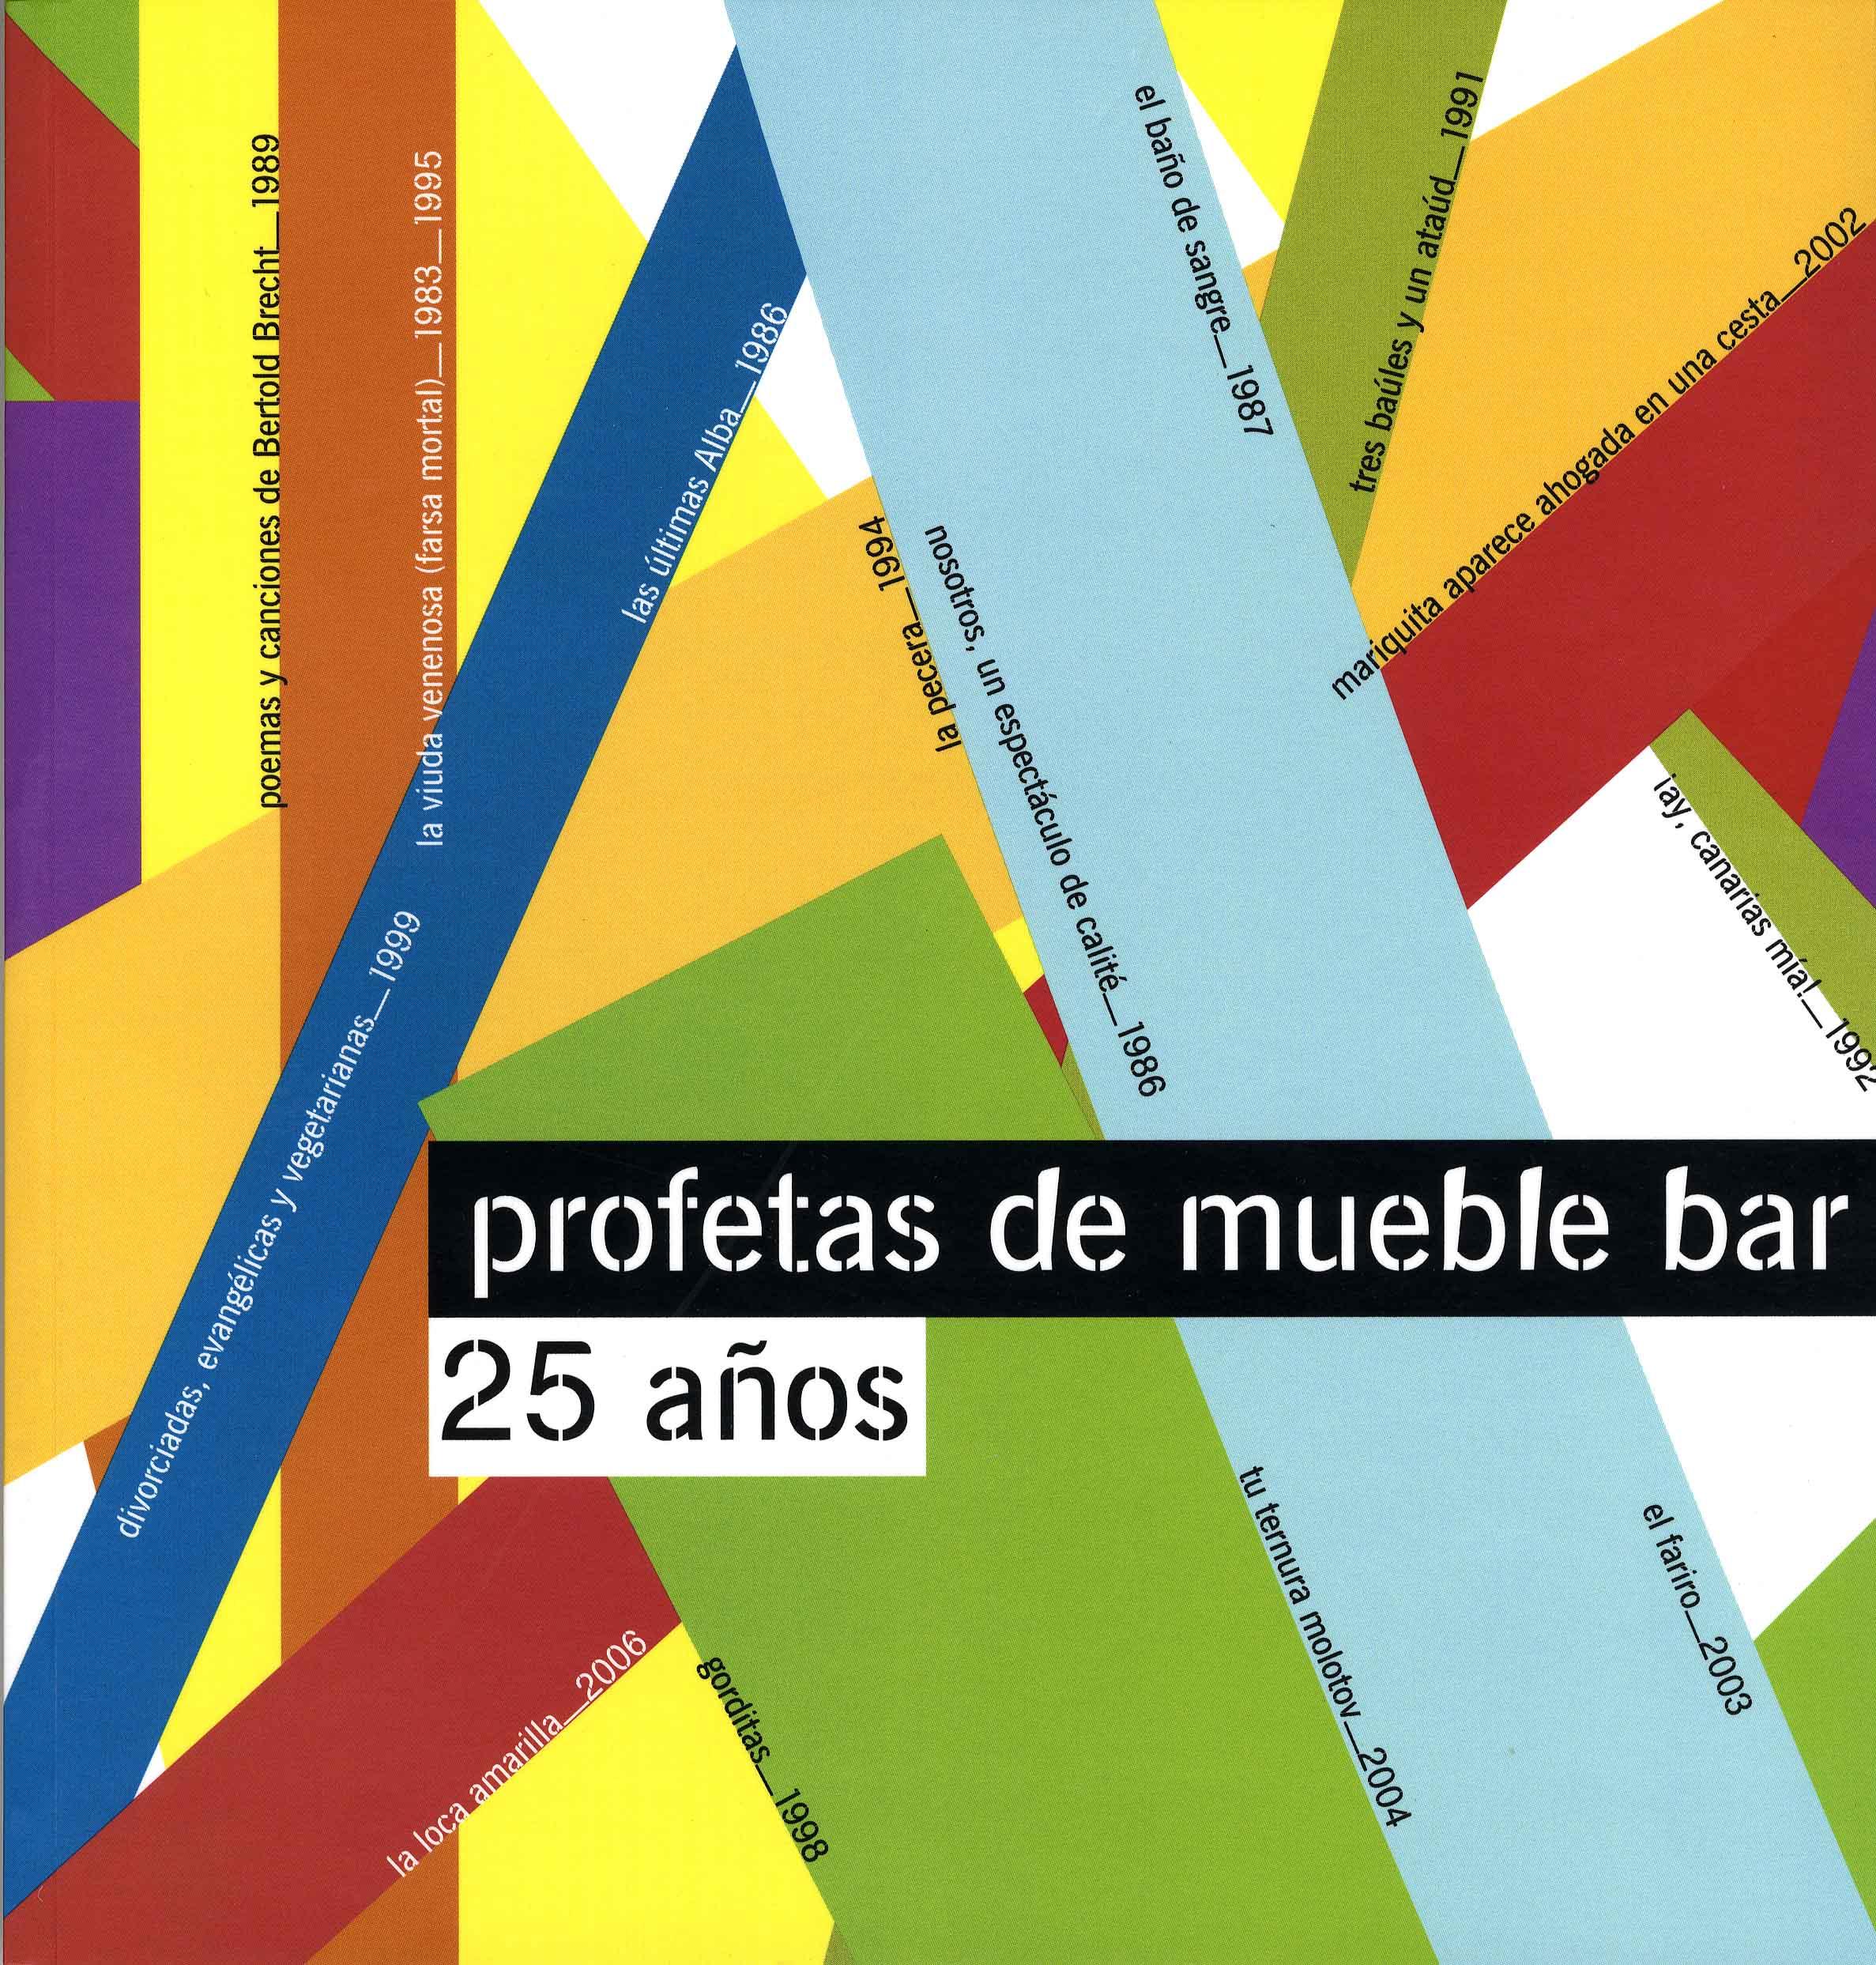 mueble bar historia 20170906081801